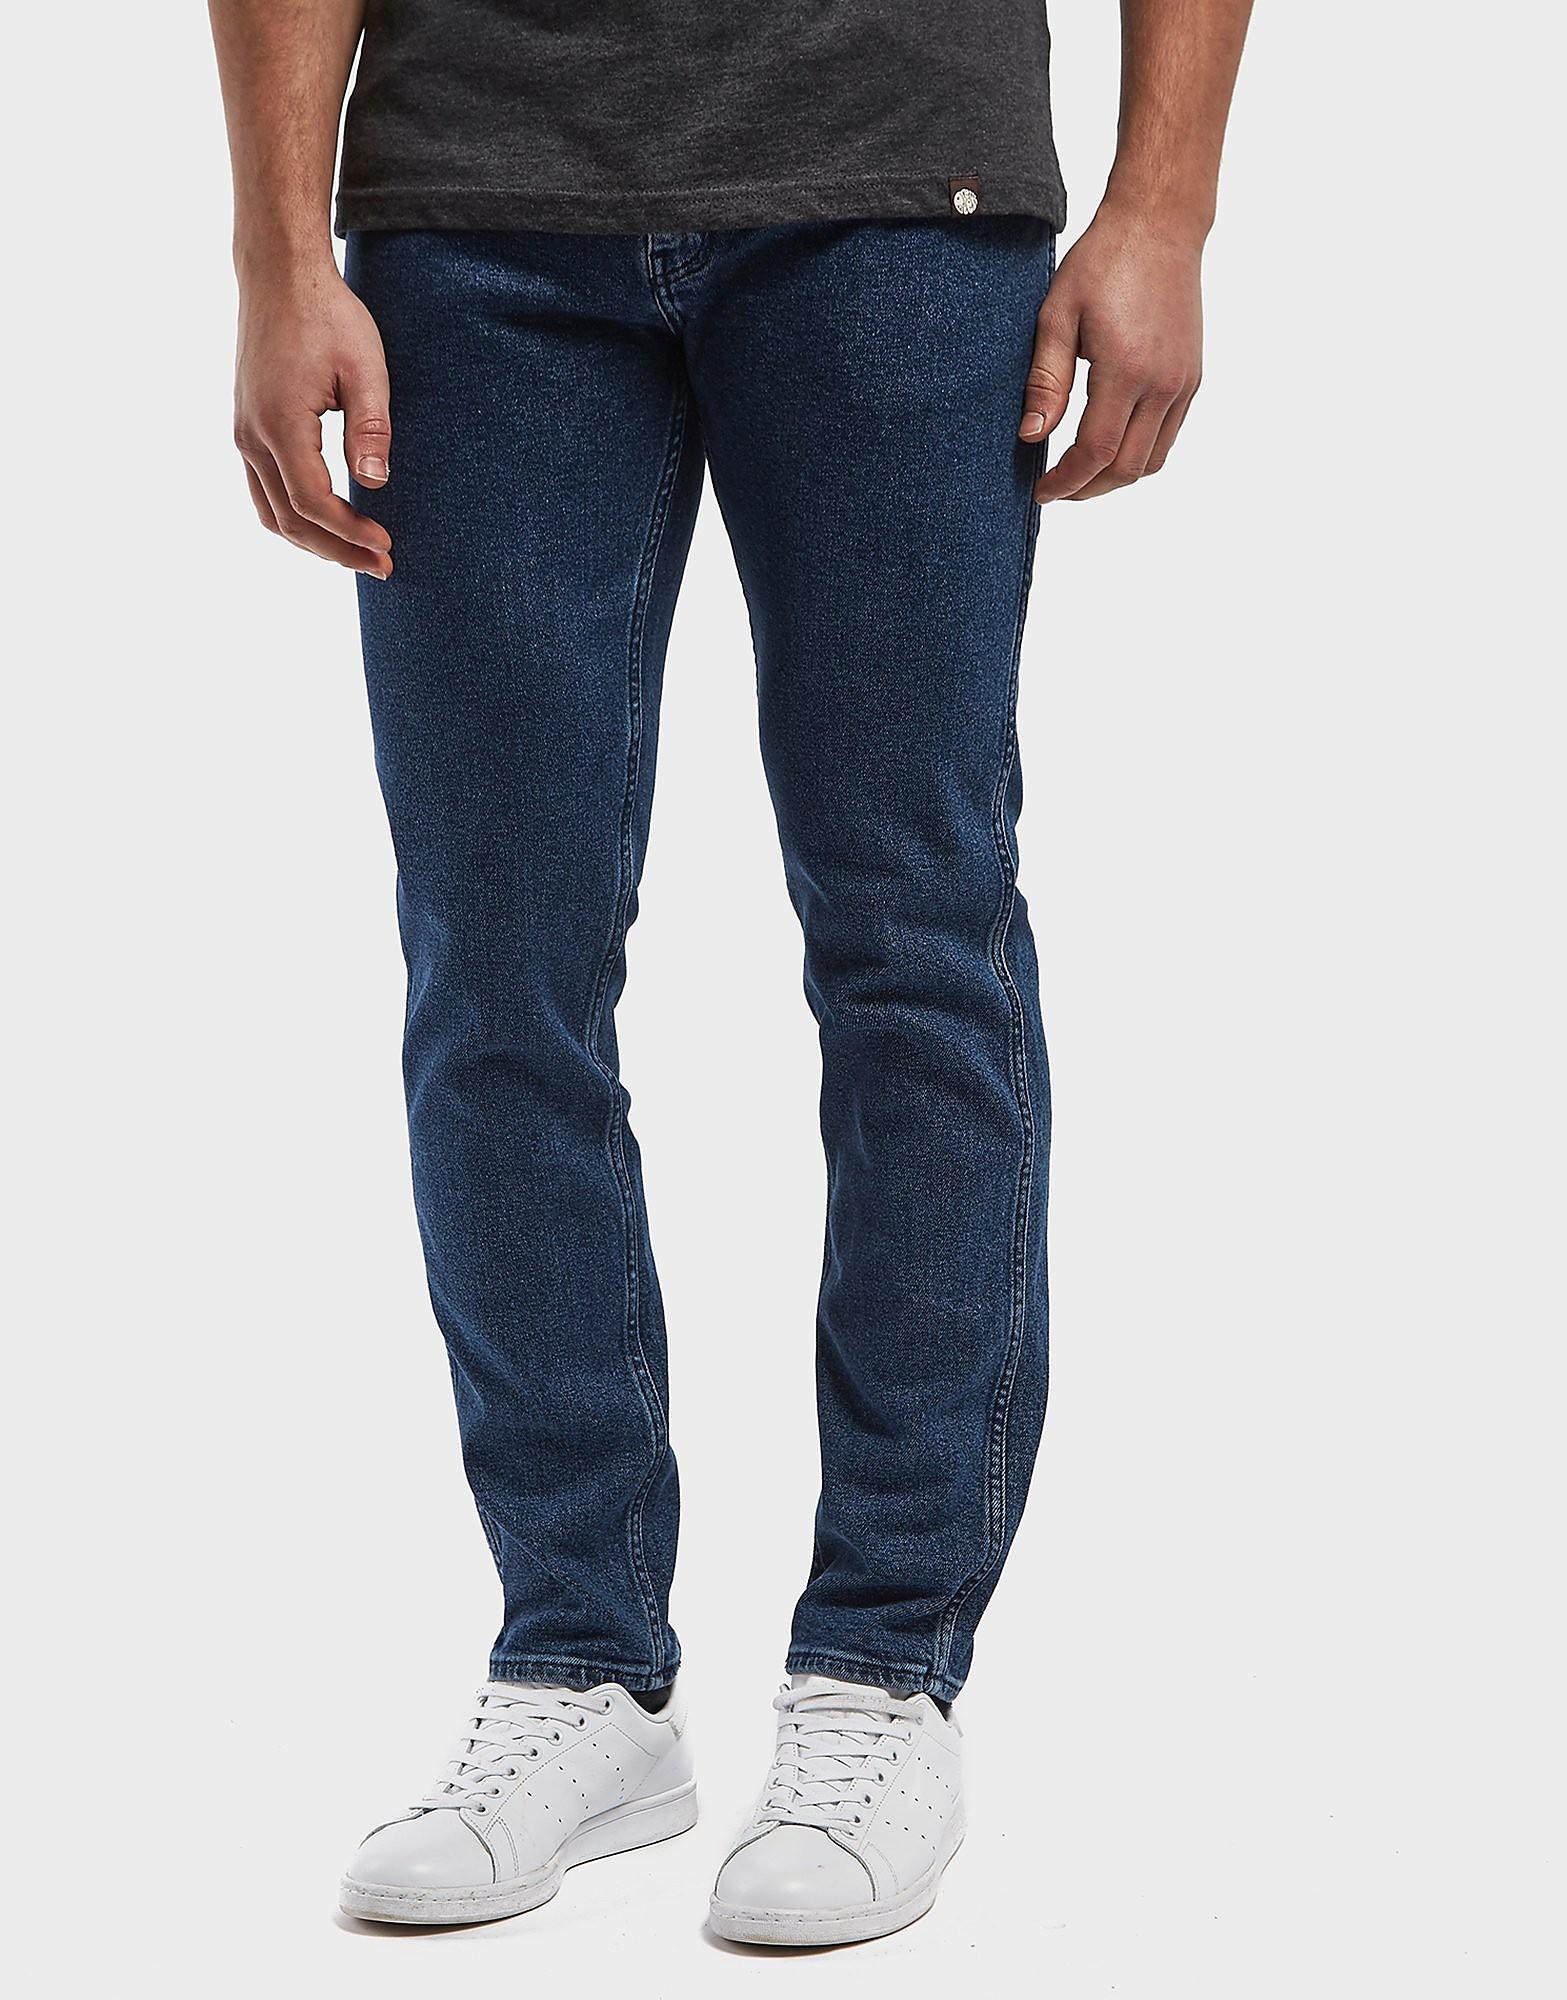 Levis Line 8 Slim Straight Jeans